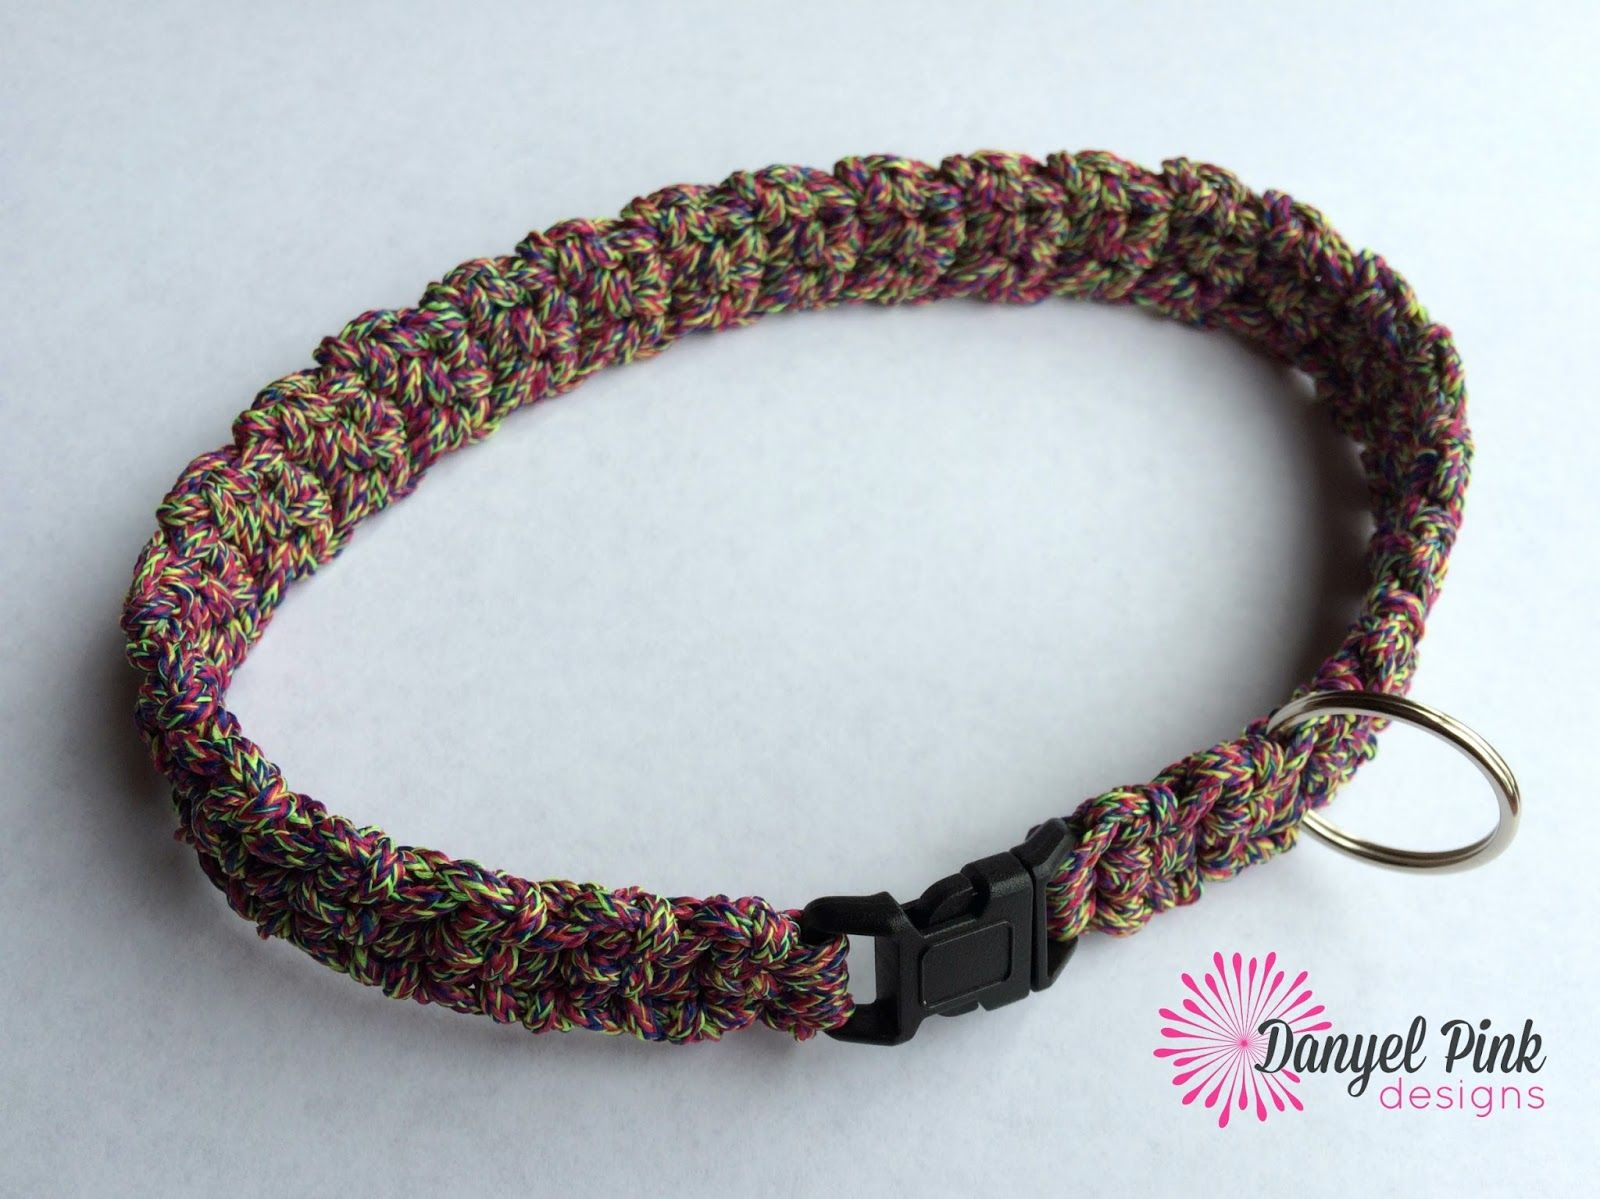 Danyel Pink Designs: FREE Crochet Pattern - Cordial Pet Collar ...